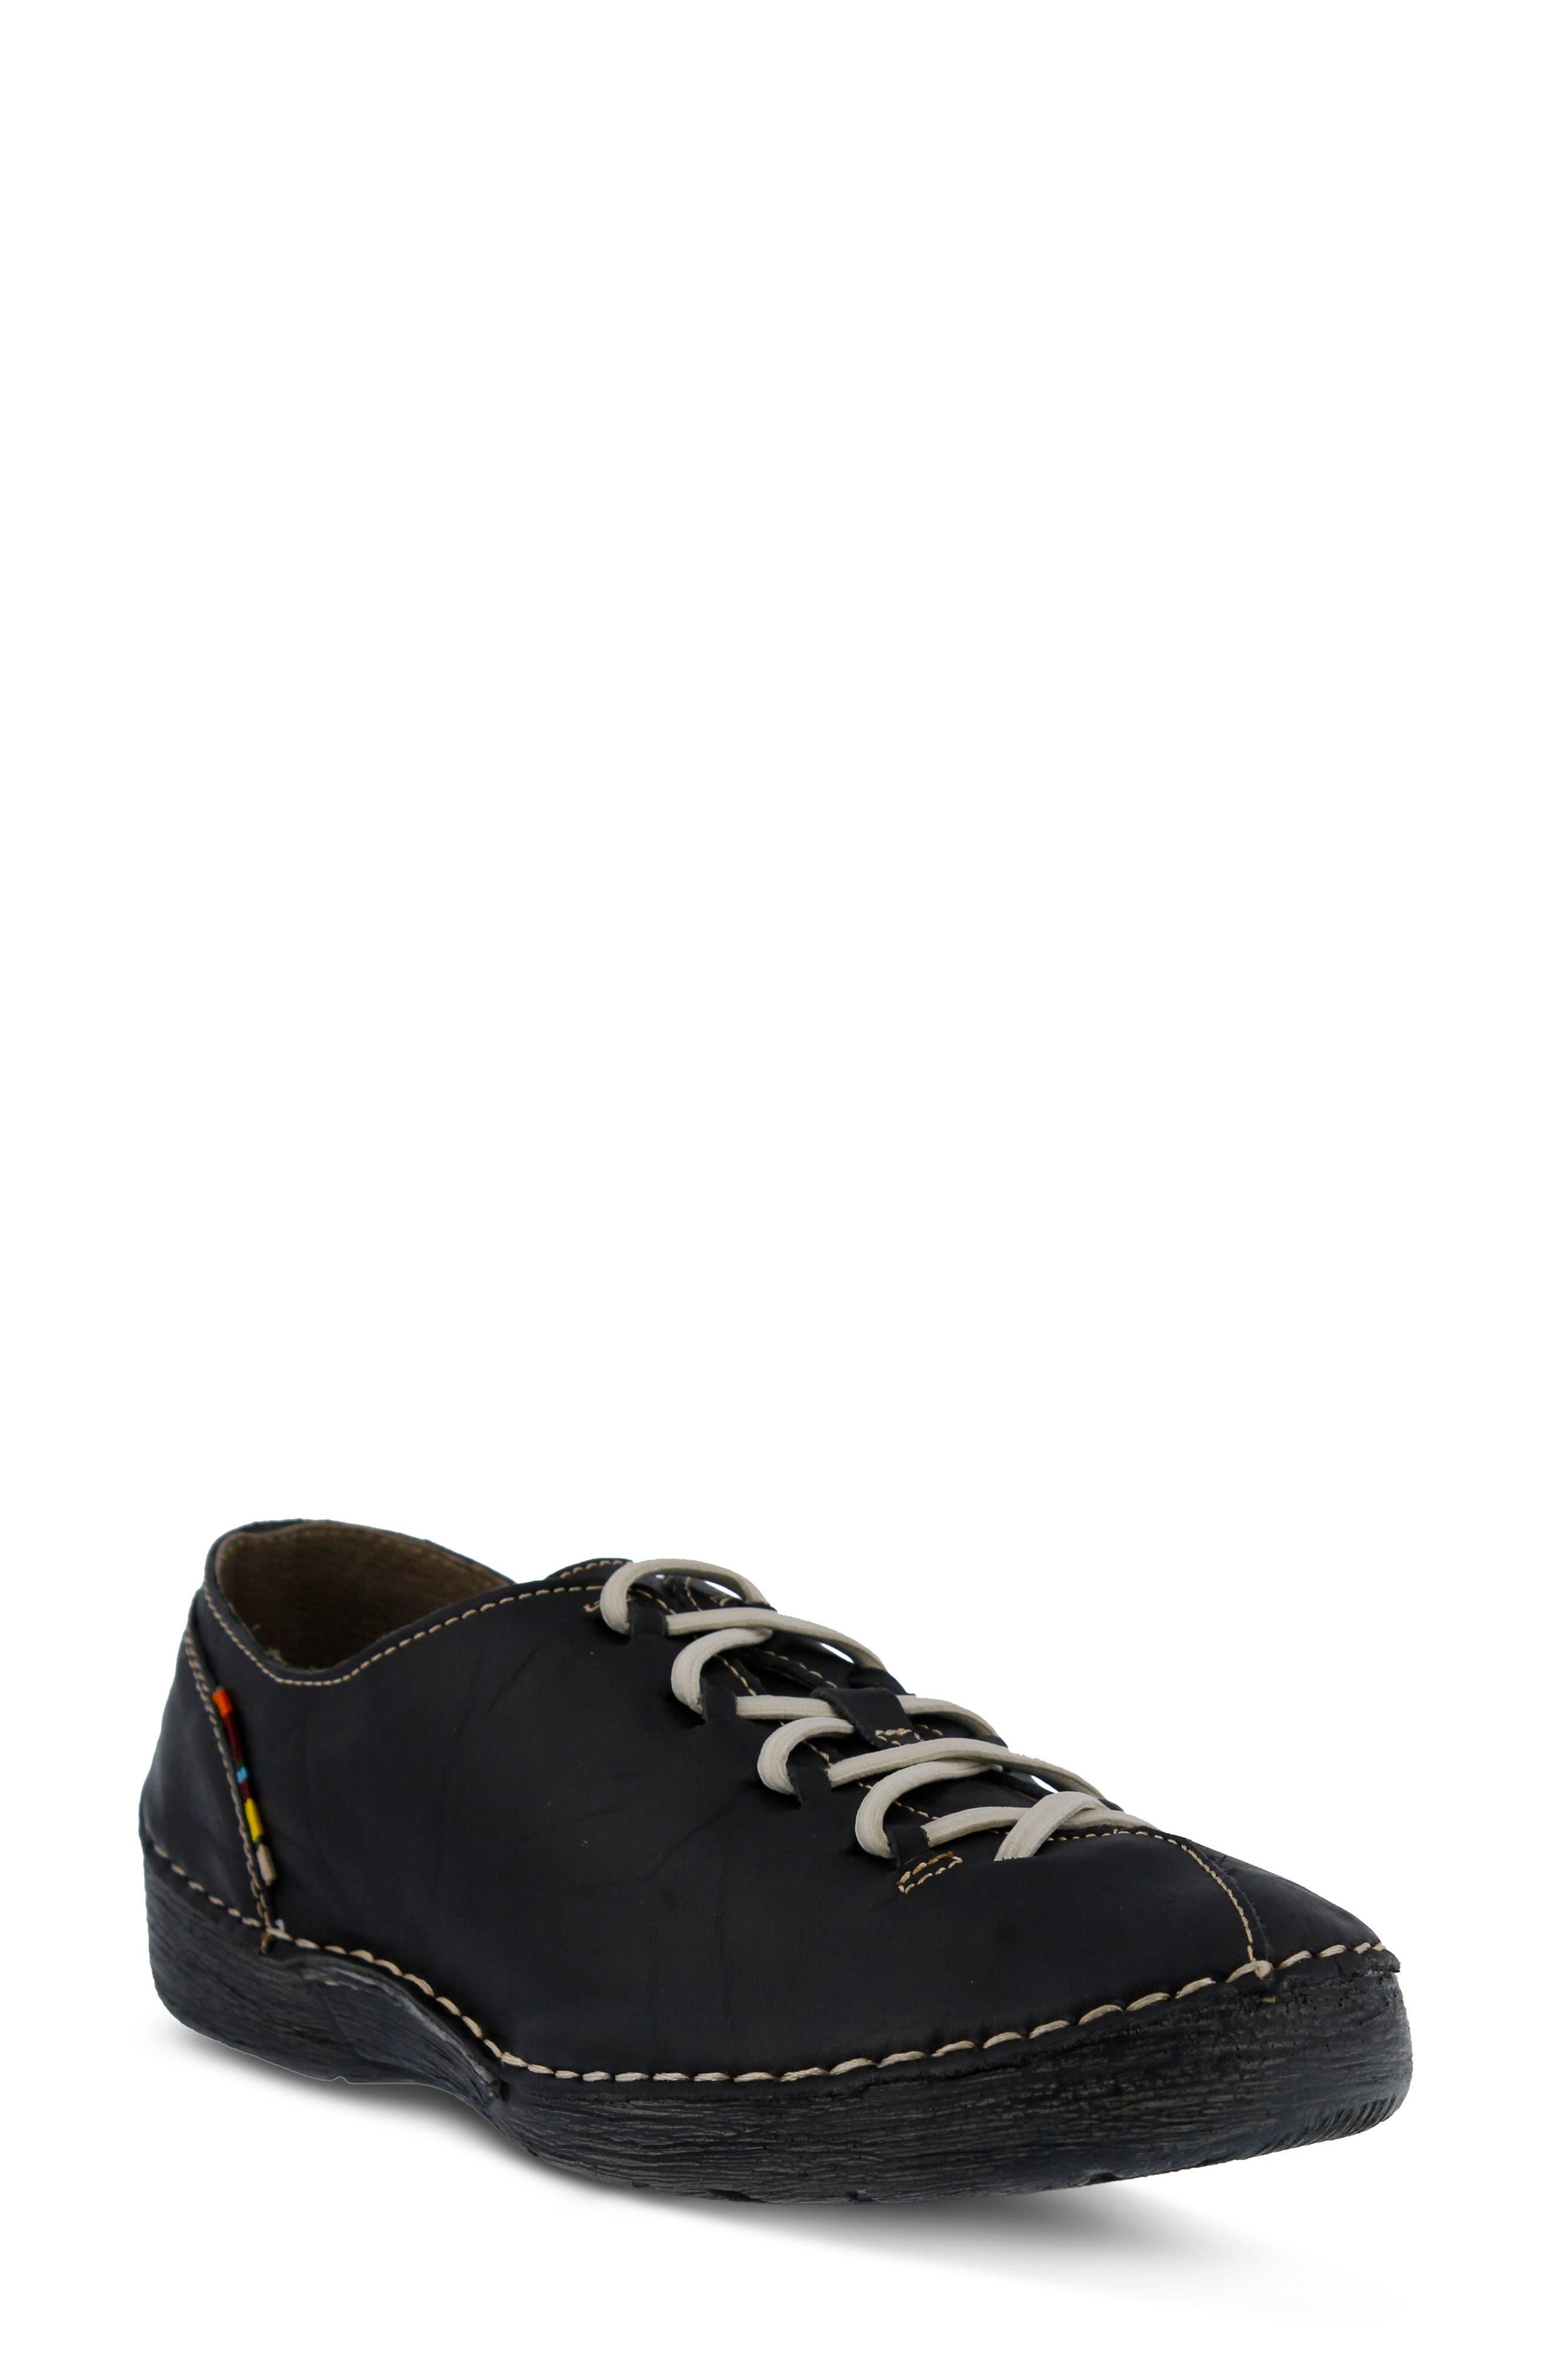 Carhop Sneaker,                             Main thumbnail 1, color,                             BLACK LEATHER